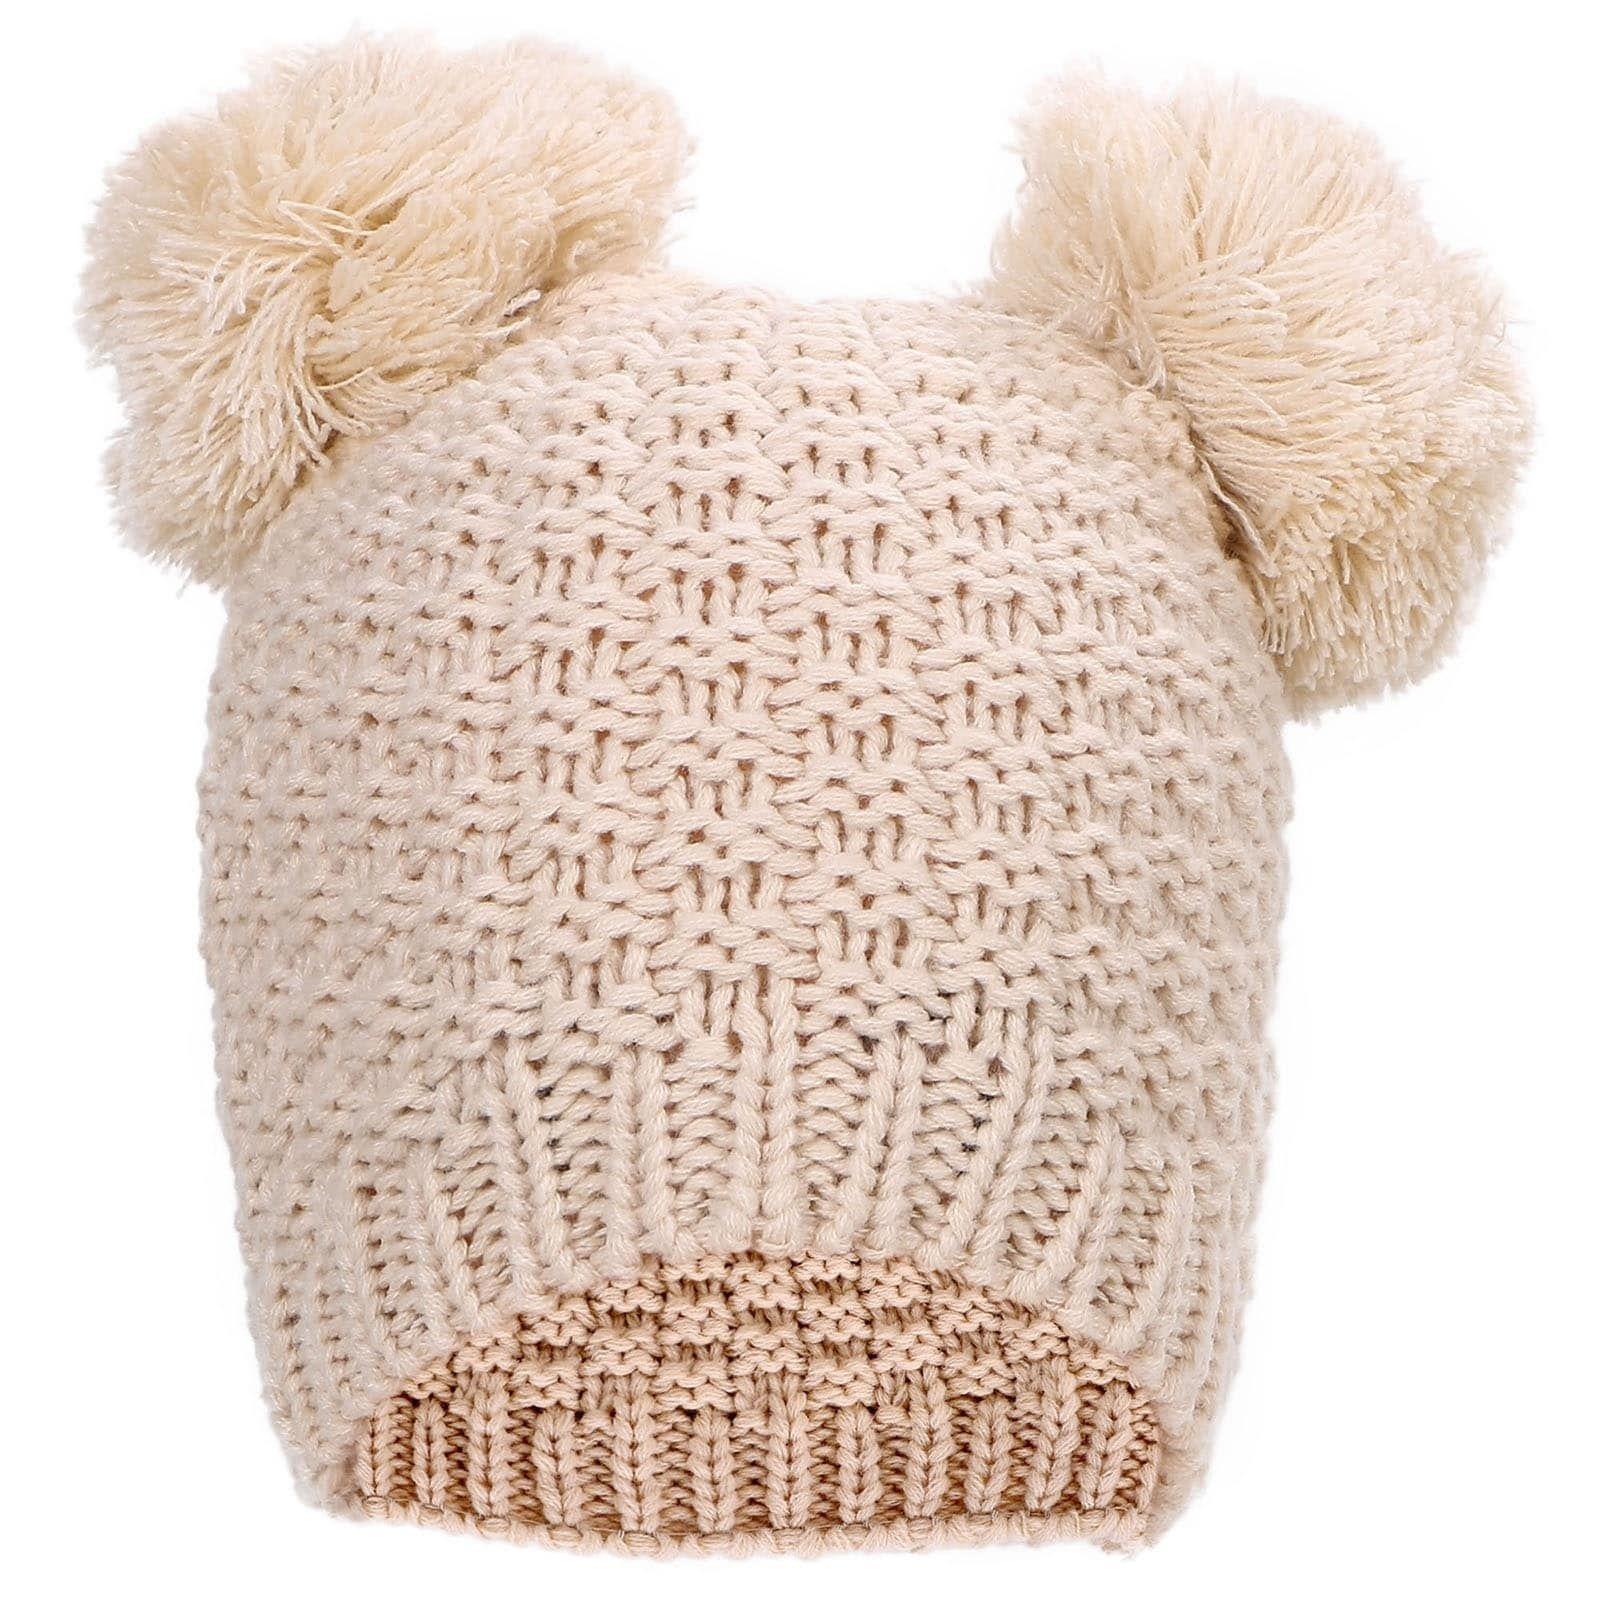 dc83b8fe3 Simplicity Women's Cute Knit Fuzzy Pompom Winter Beanie Hat (Beige ...